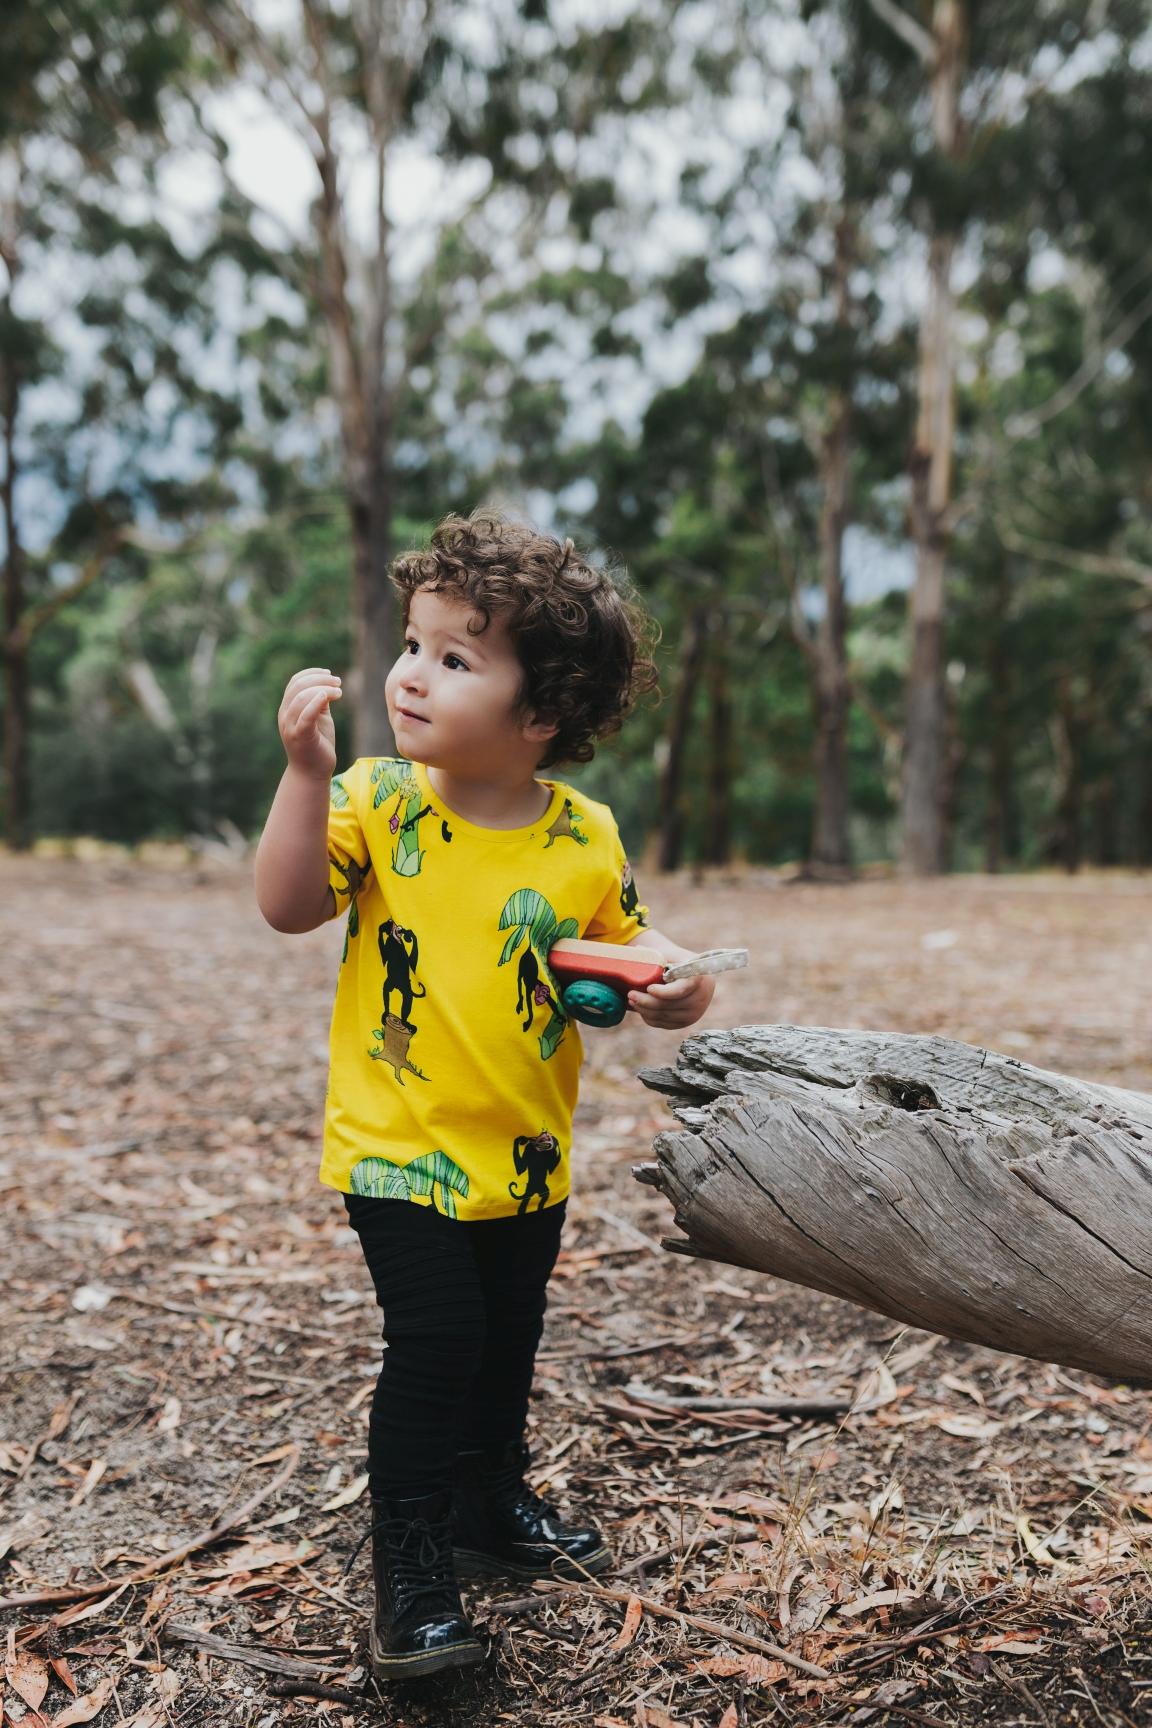 boy-yellow-tshirt-commercial-photography-siida-tasmania.jpg